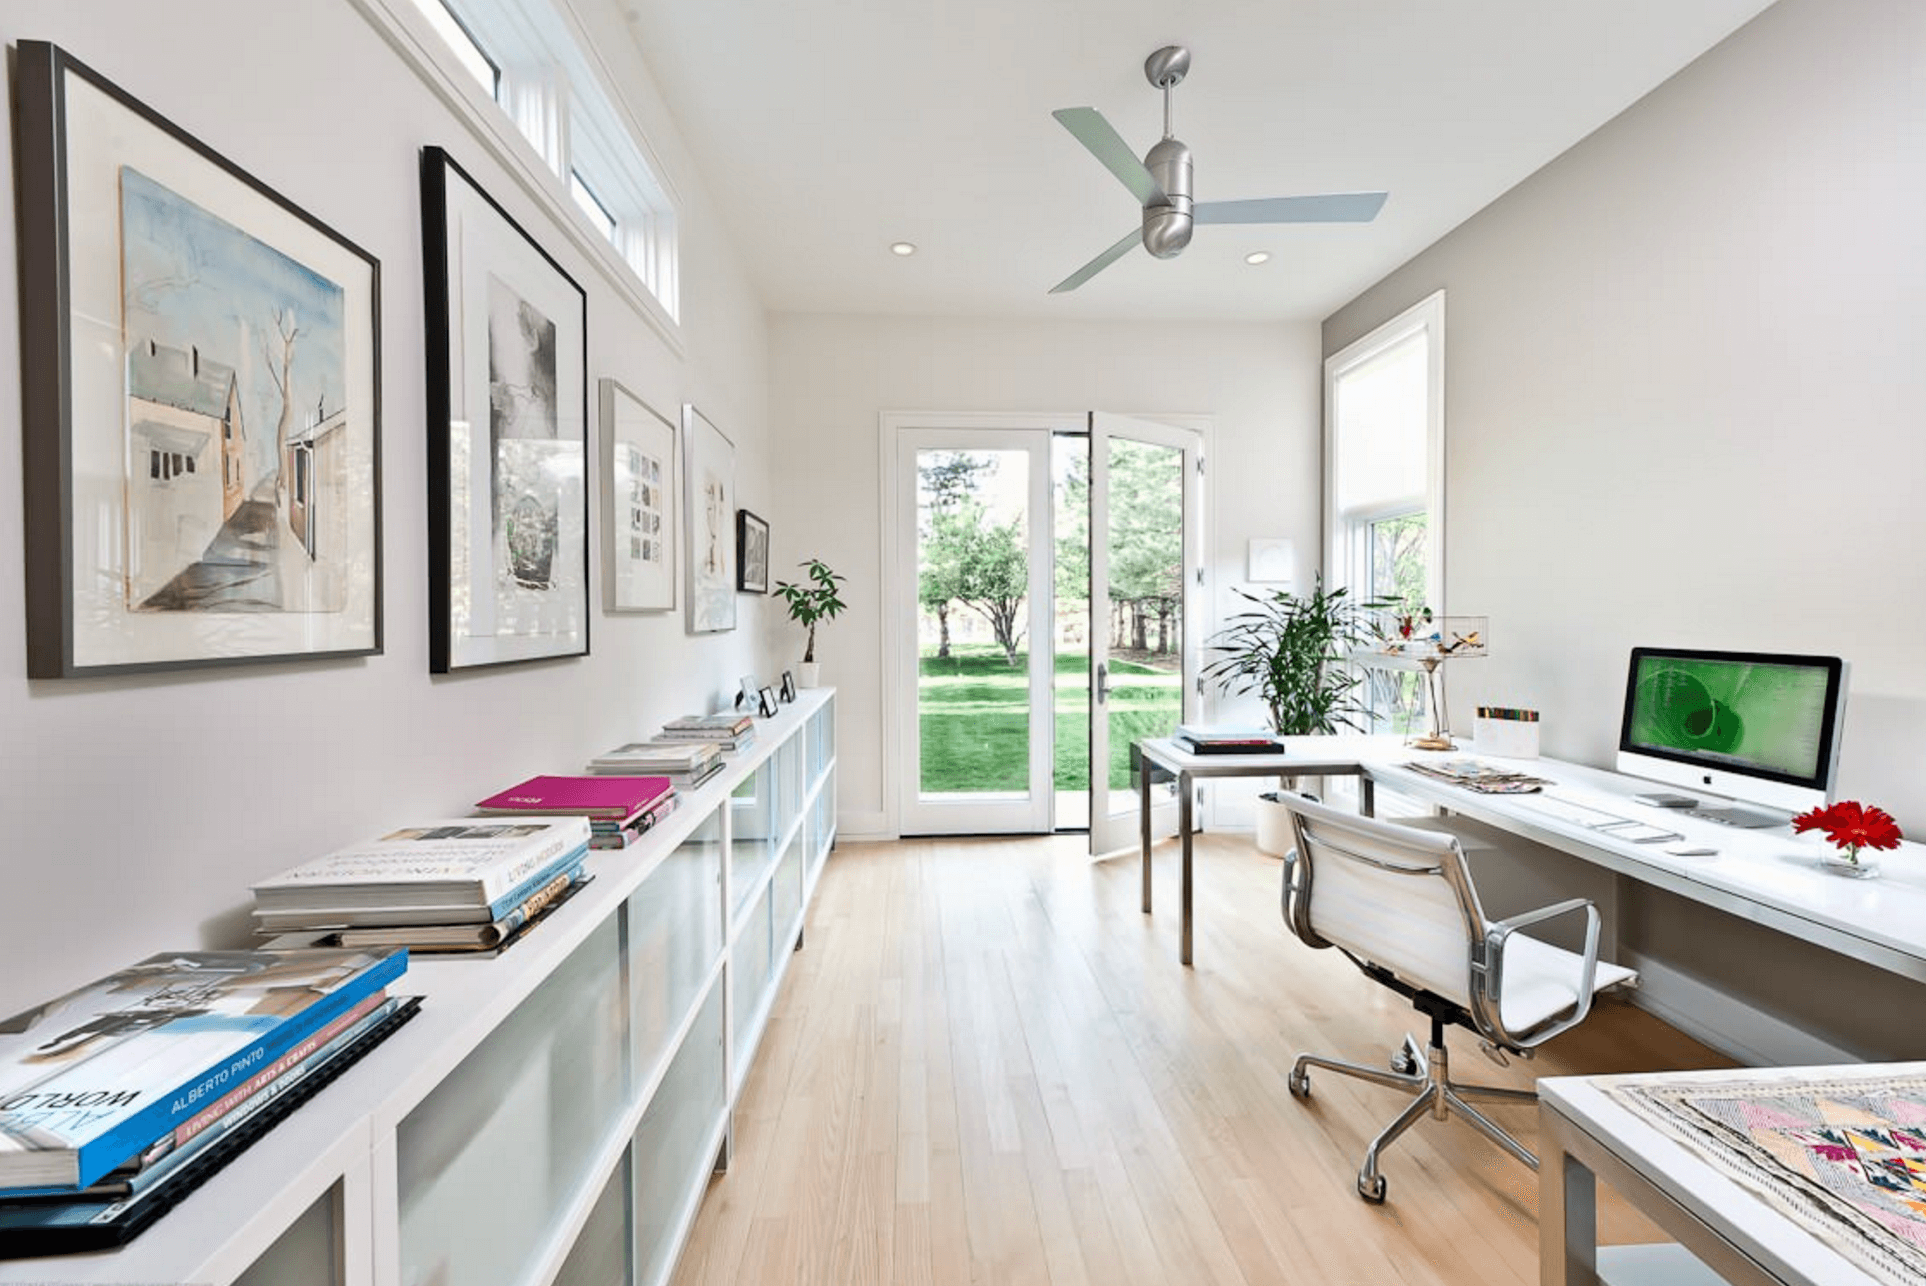 Modern Home Office Furniture Home Design Ideas Pictures: 4 Modern Ideas For Your Home Office Décor